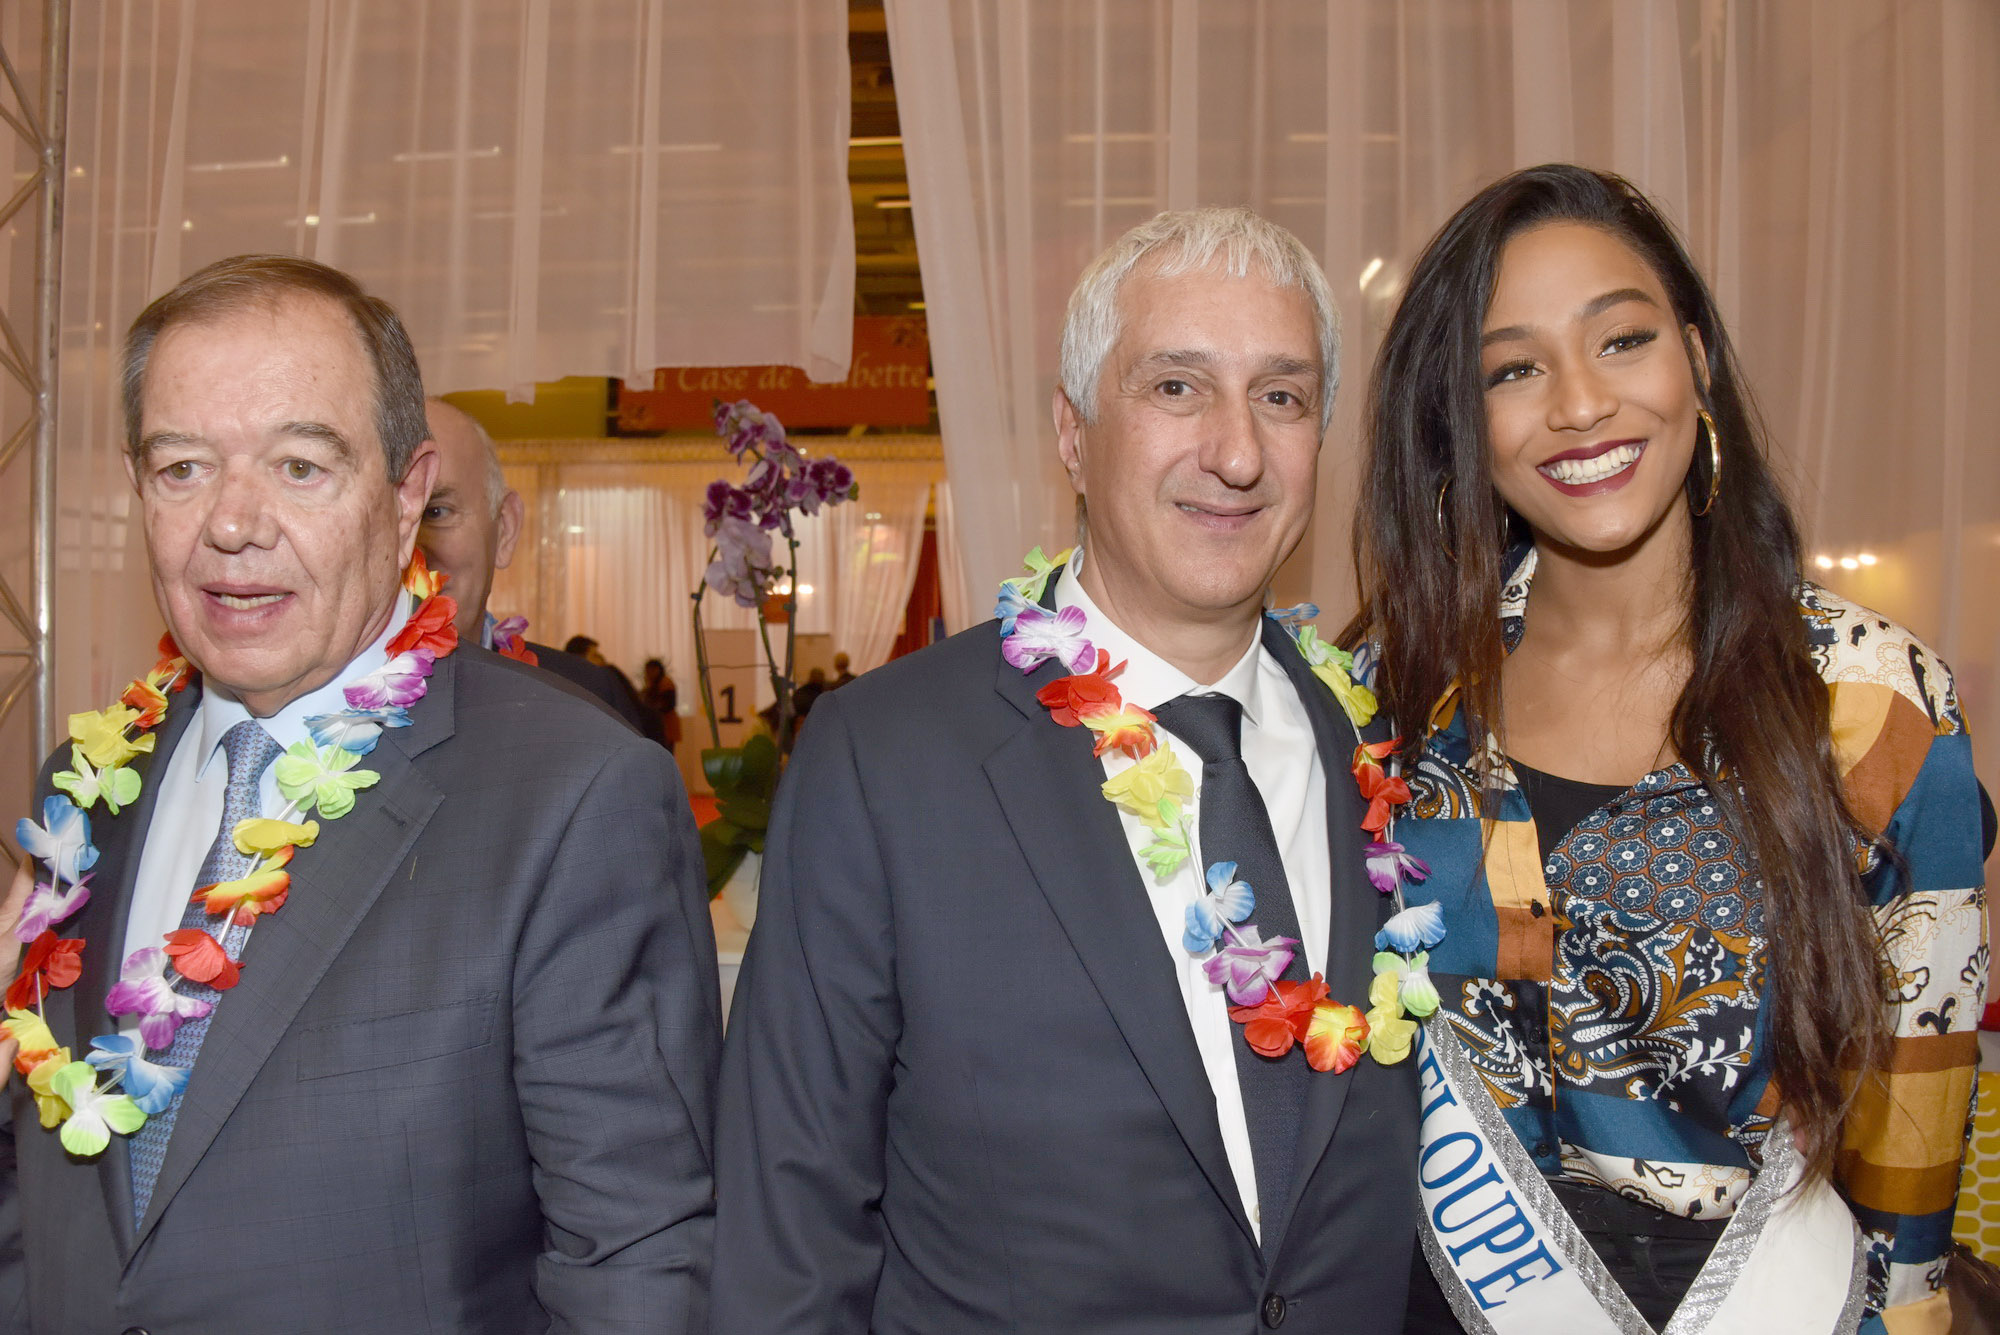 Patrick Ollier, Stéphane Layani, et Morgane Thérésine